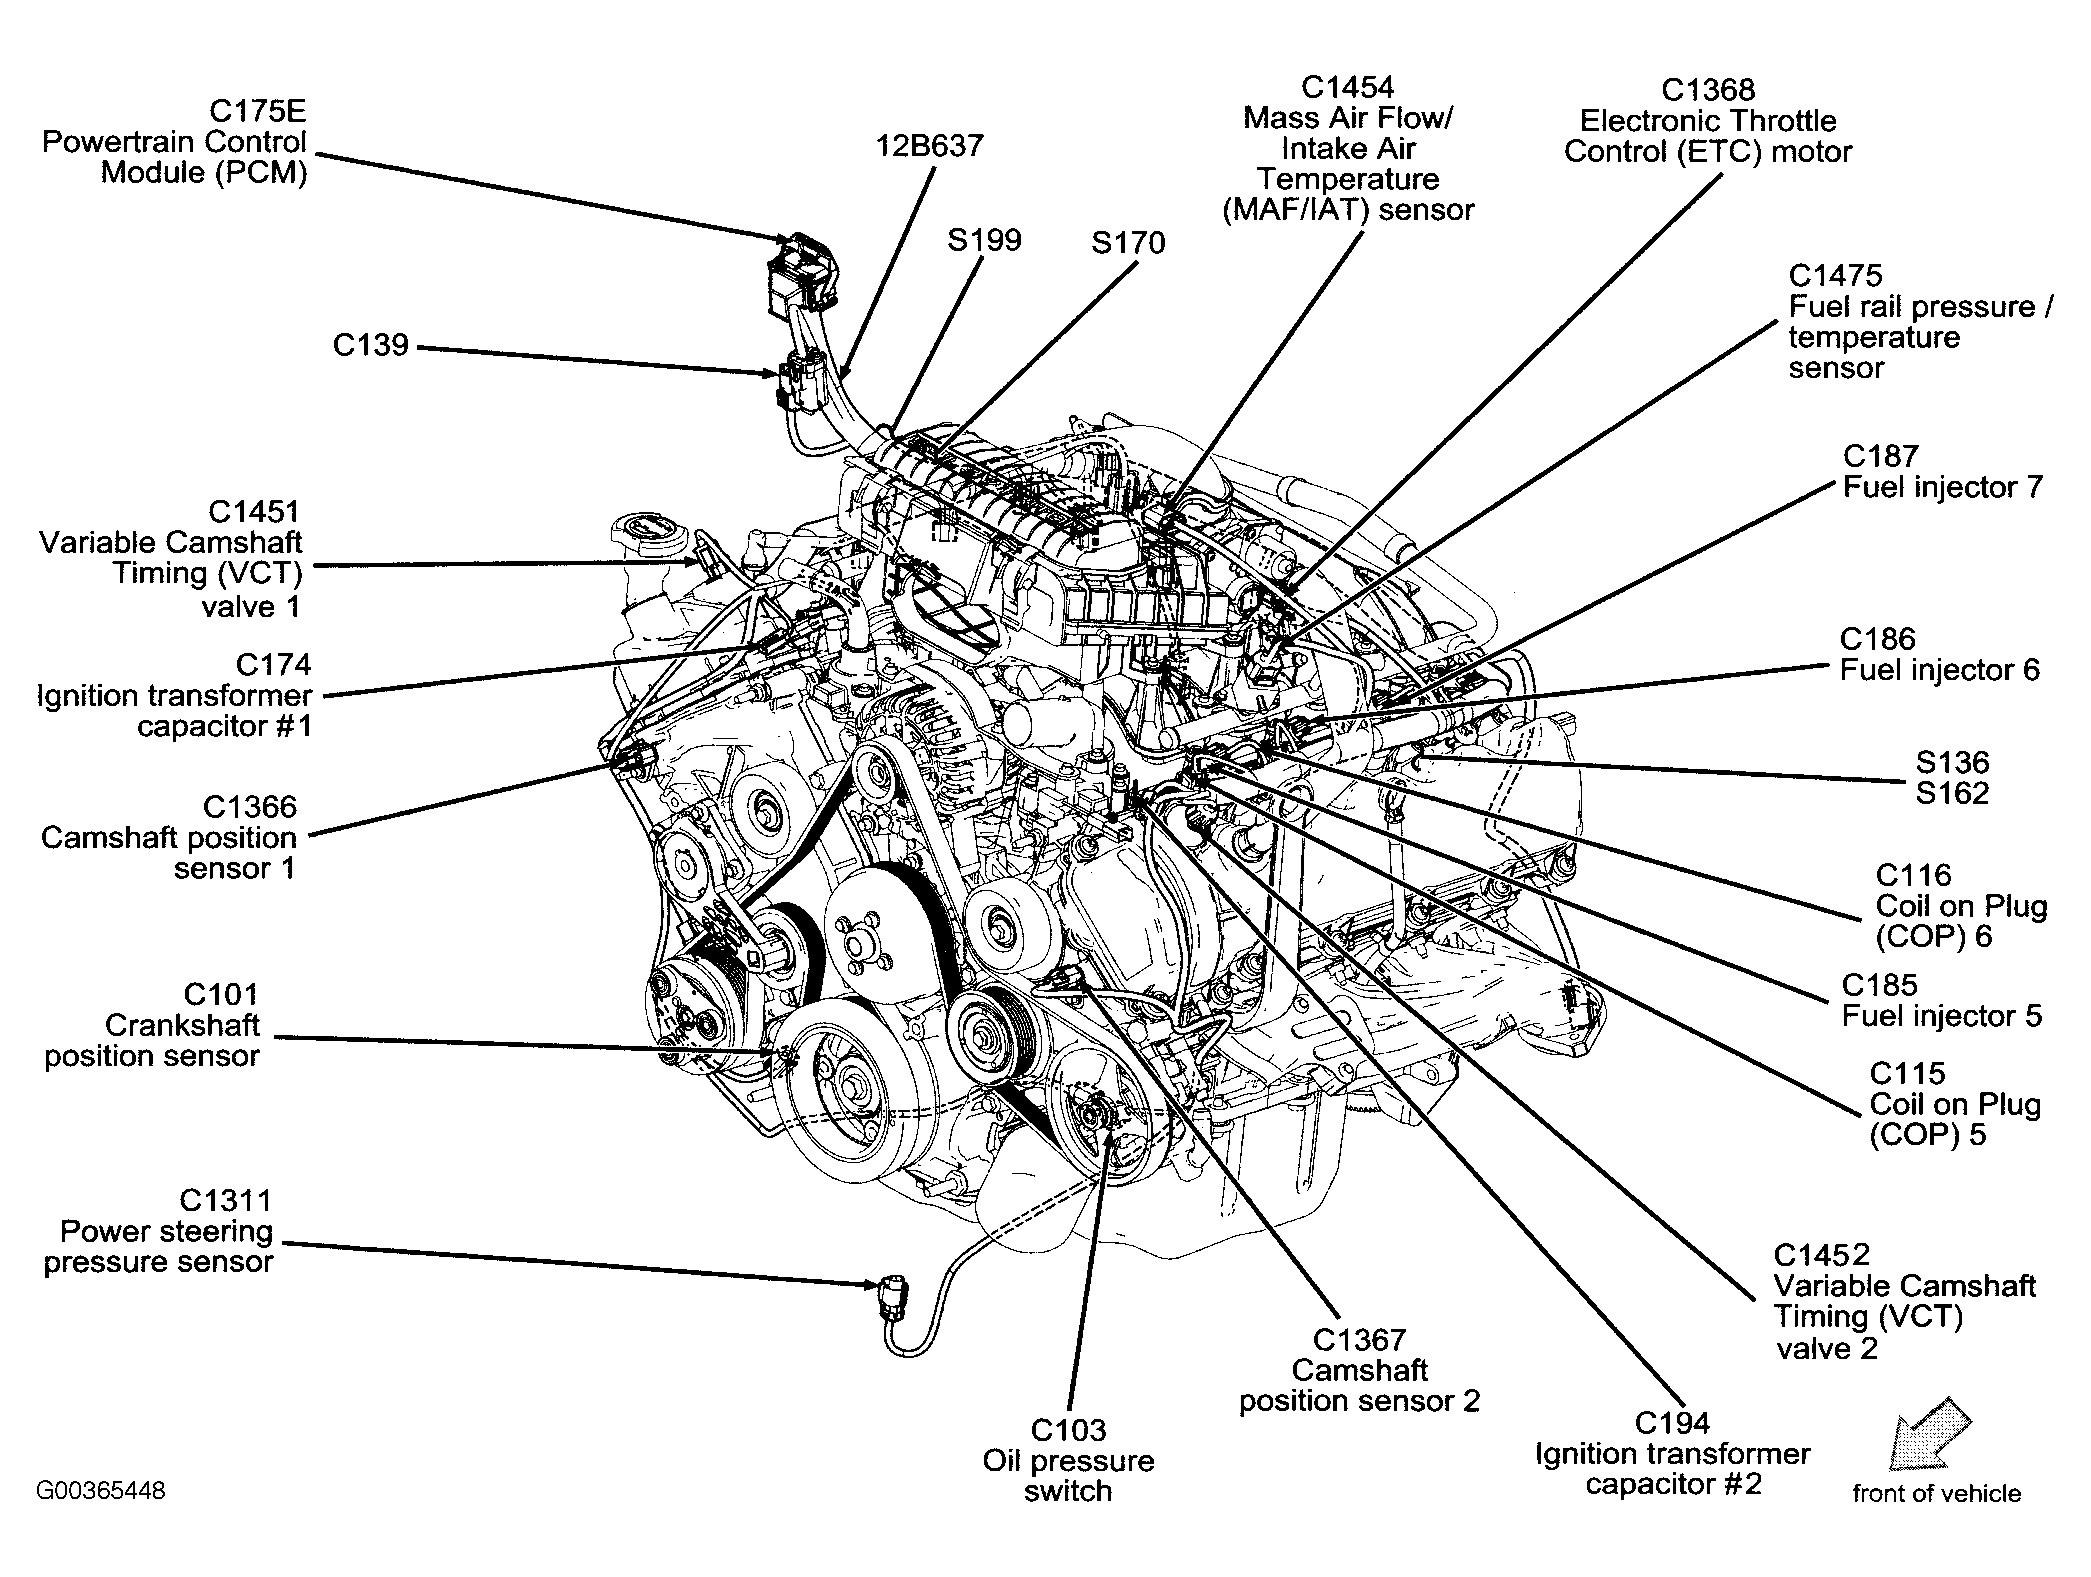 Wiring Diagram Likewise 2004 Ford Ranger Fog Light Wiring Diagram